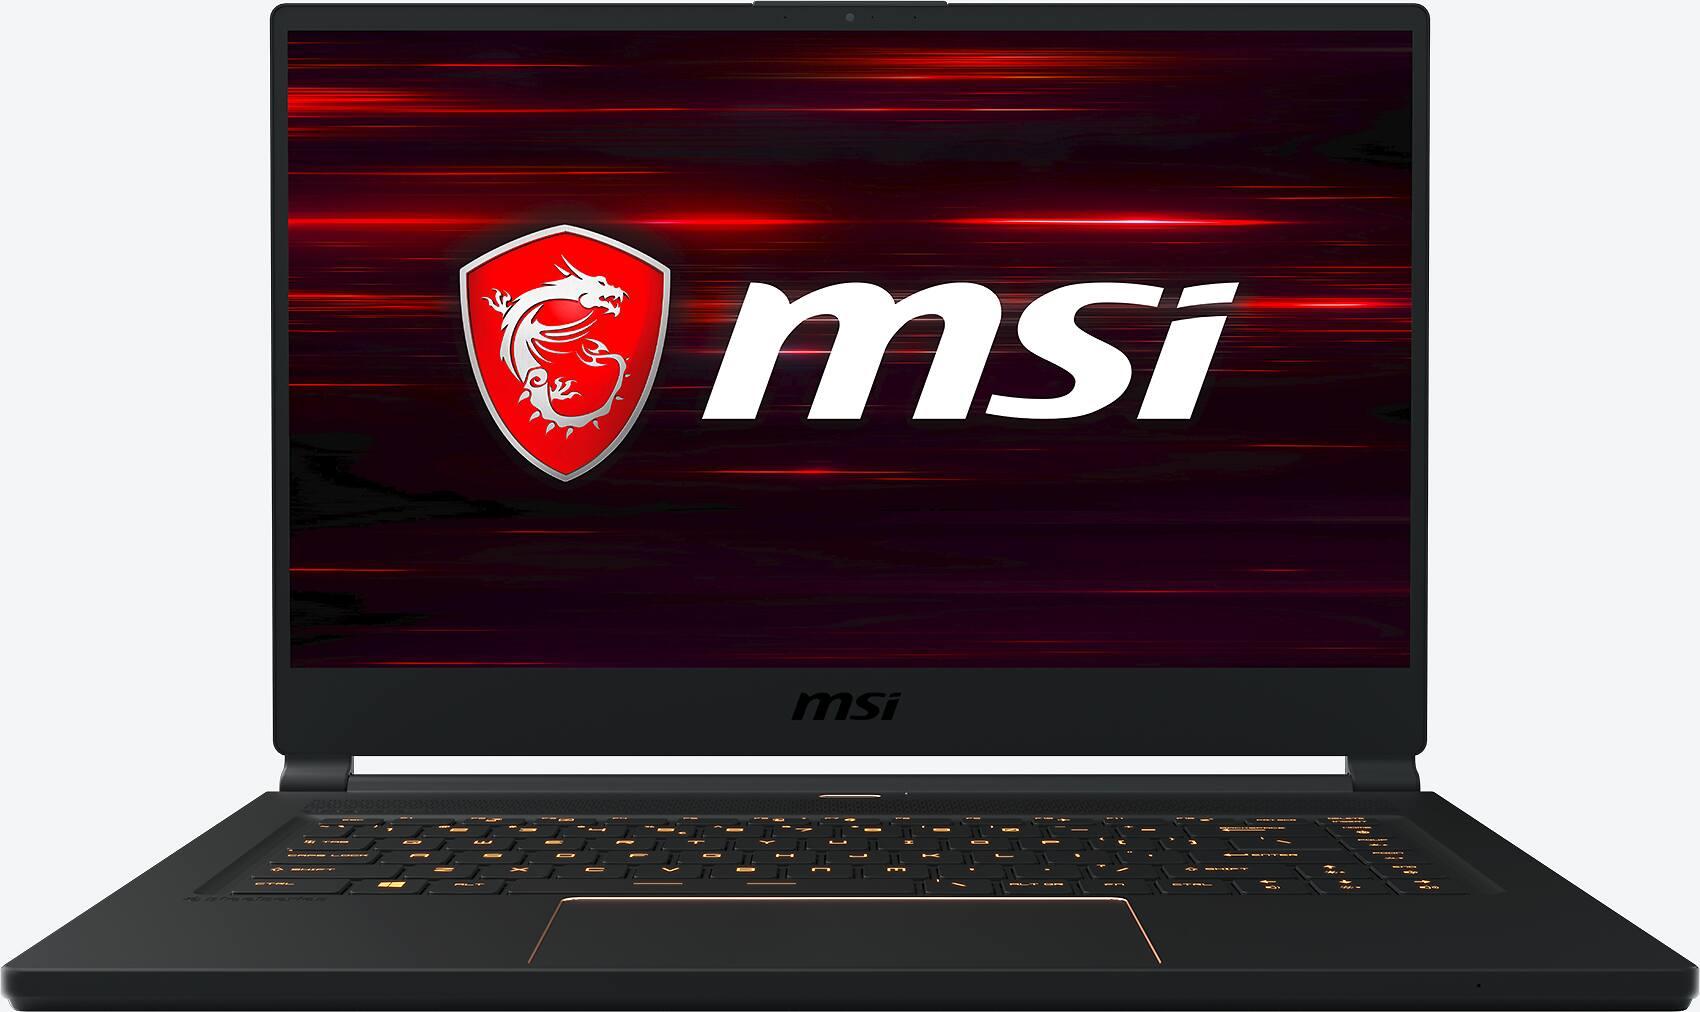 MSI Gaming Series GS65 9SG-444 Stealth